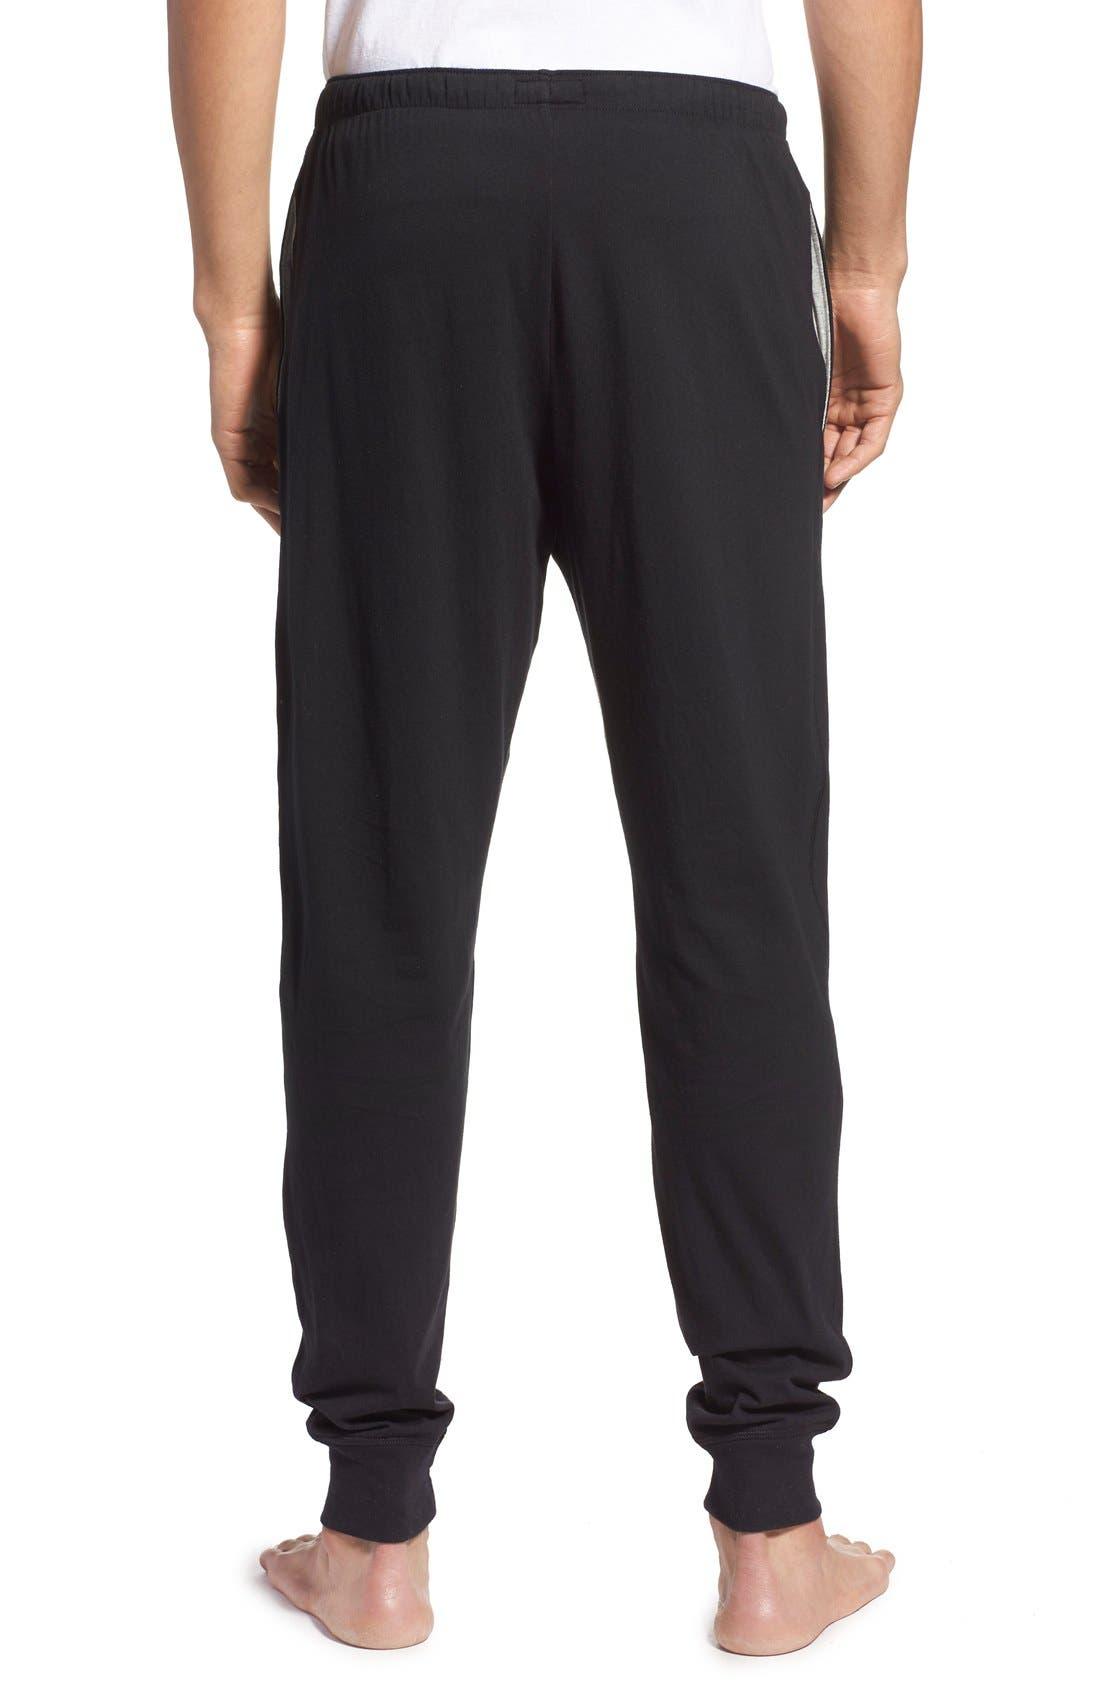 POLO RALPH LAUREN, Relaxed Fit Cotton Knit Lounge Jogger Pants, Alternate thumbnail 2, color, BLACK